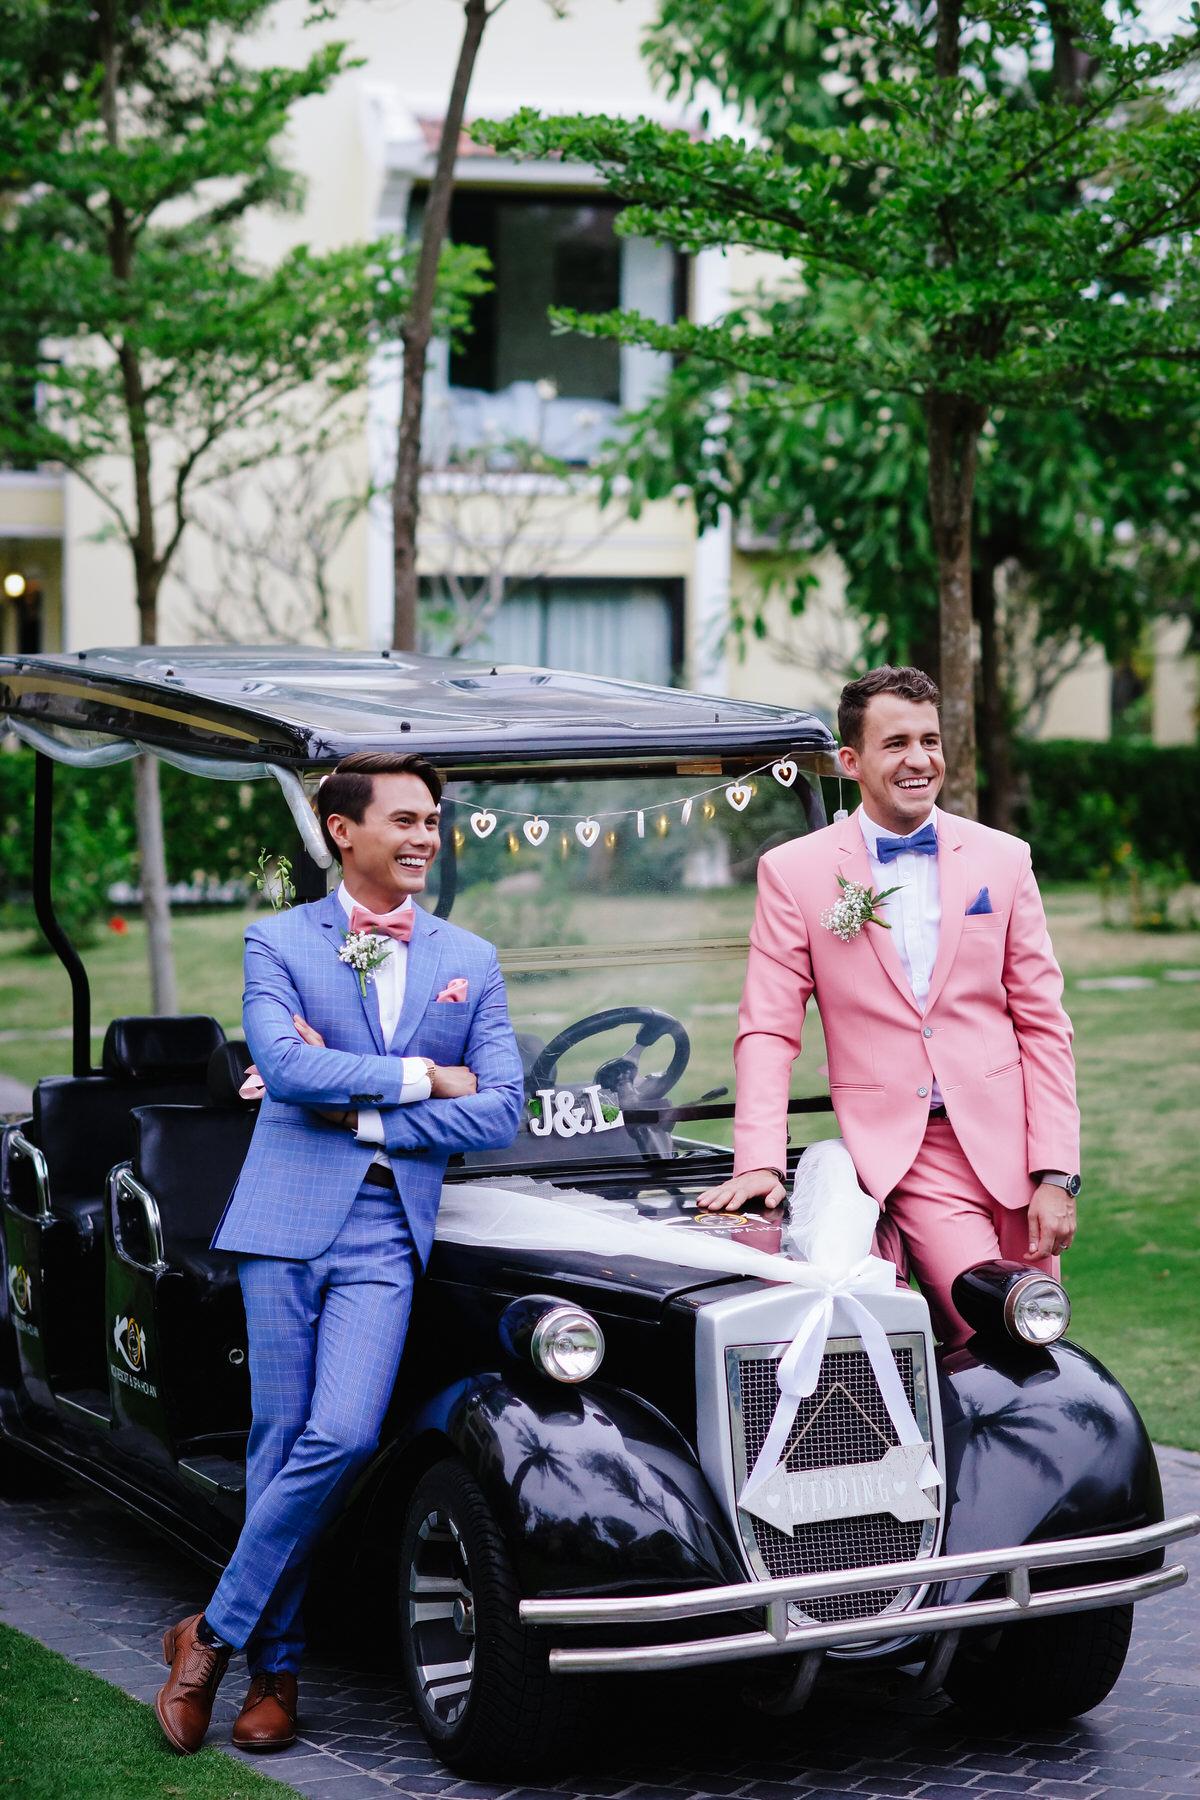 Vietnam-Samesex-Wedding-17.jpg